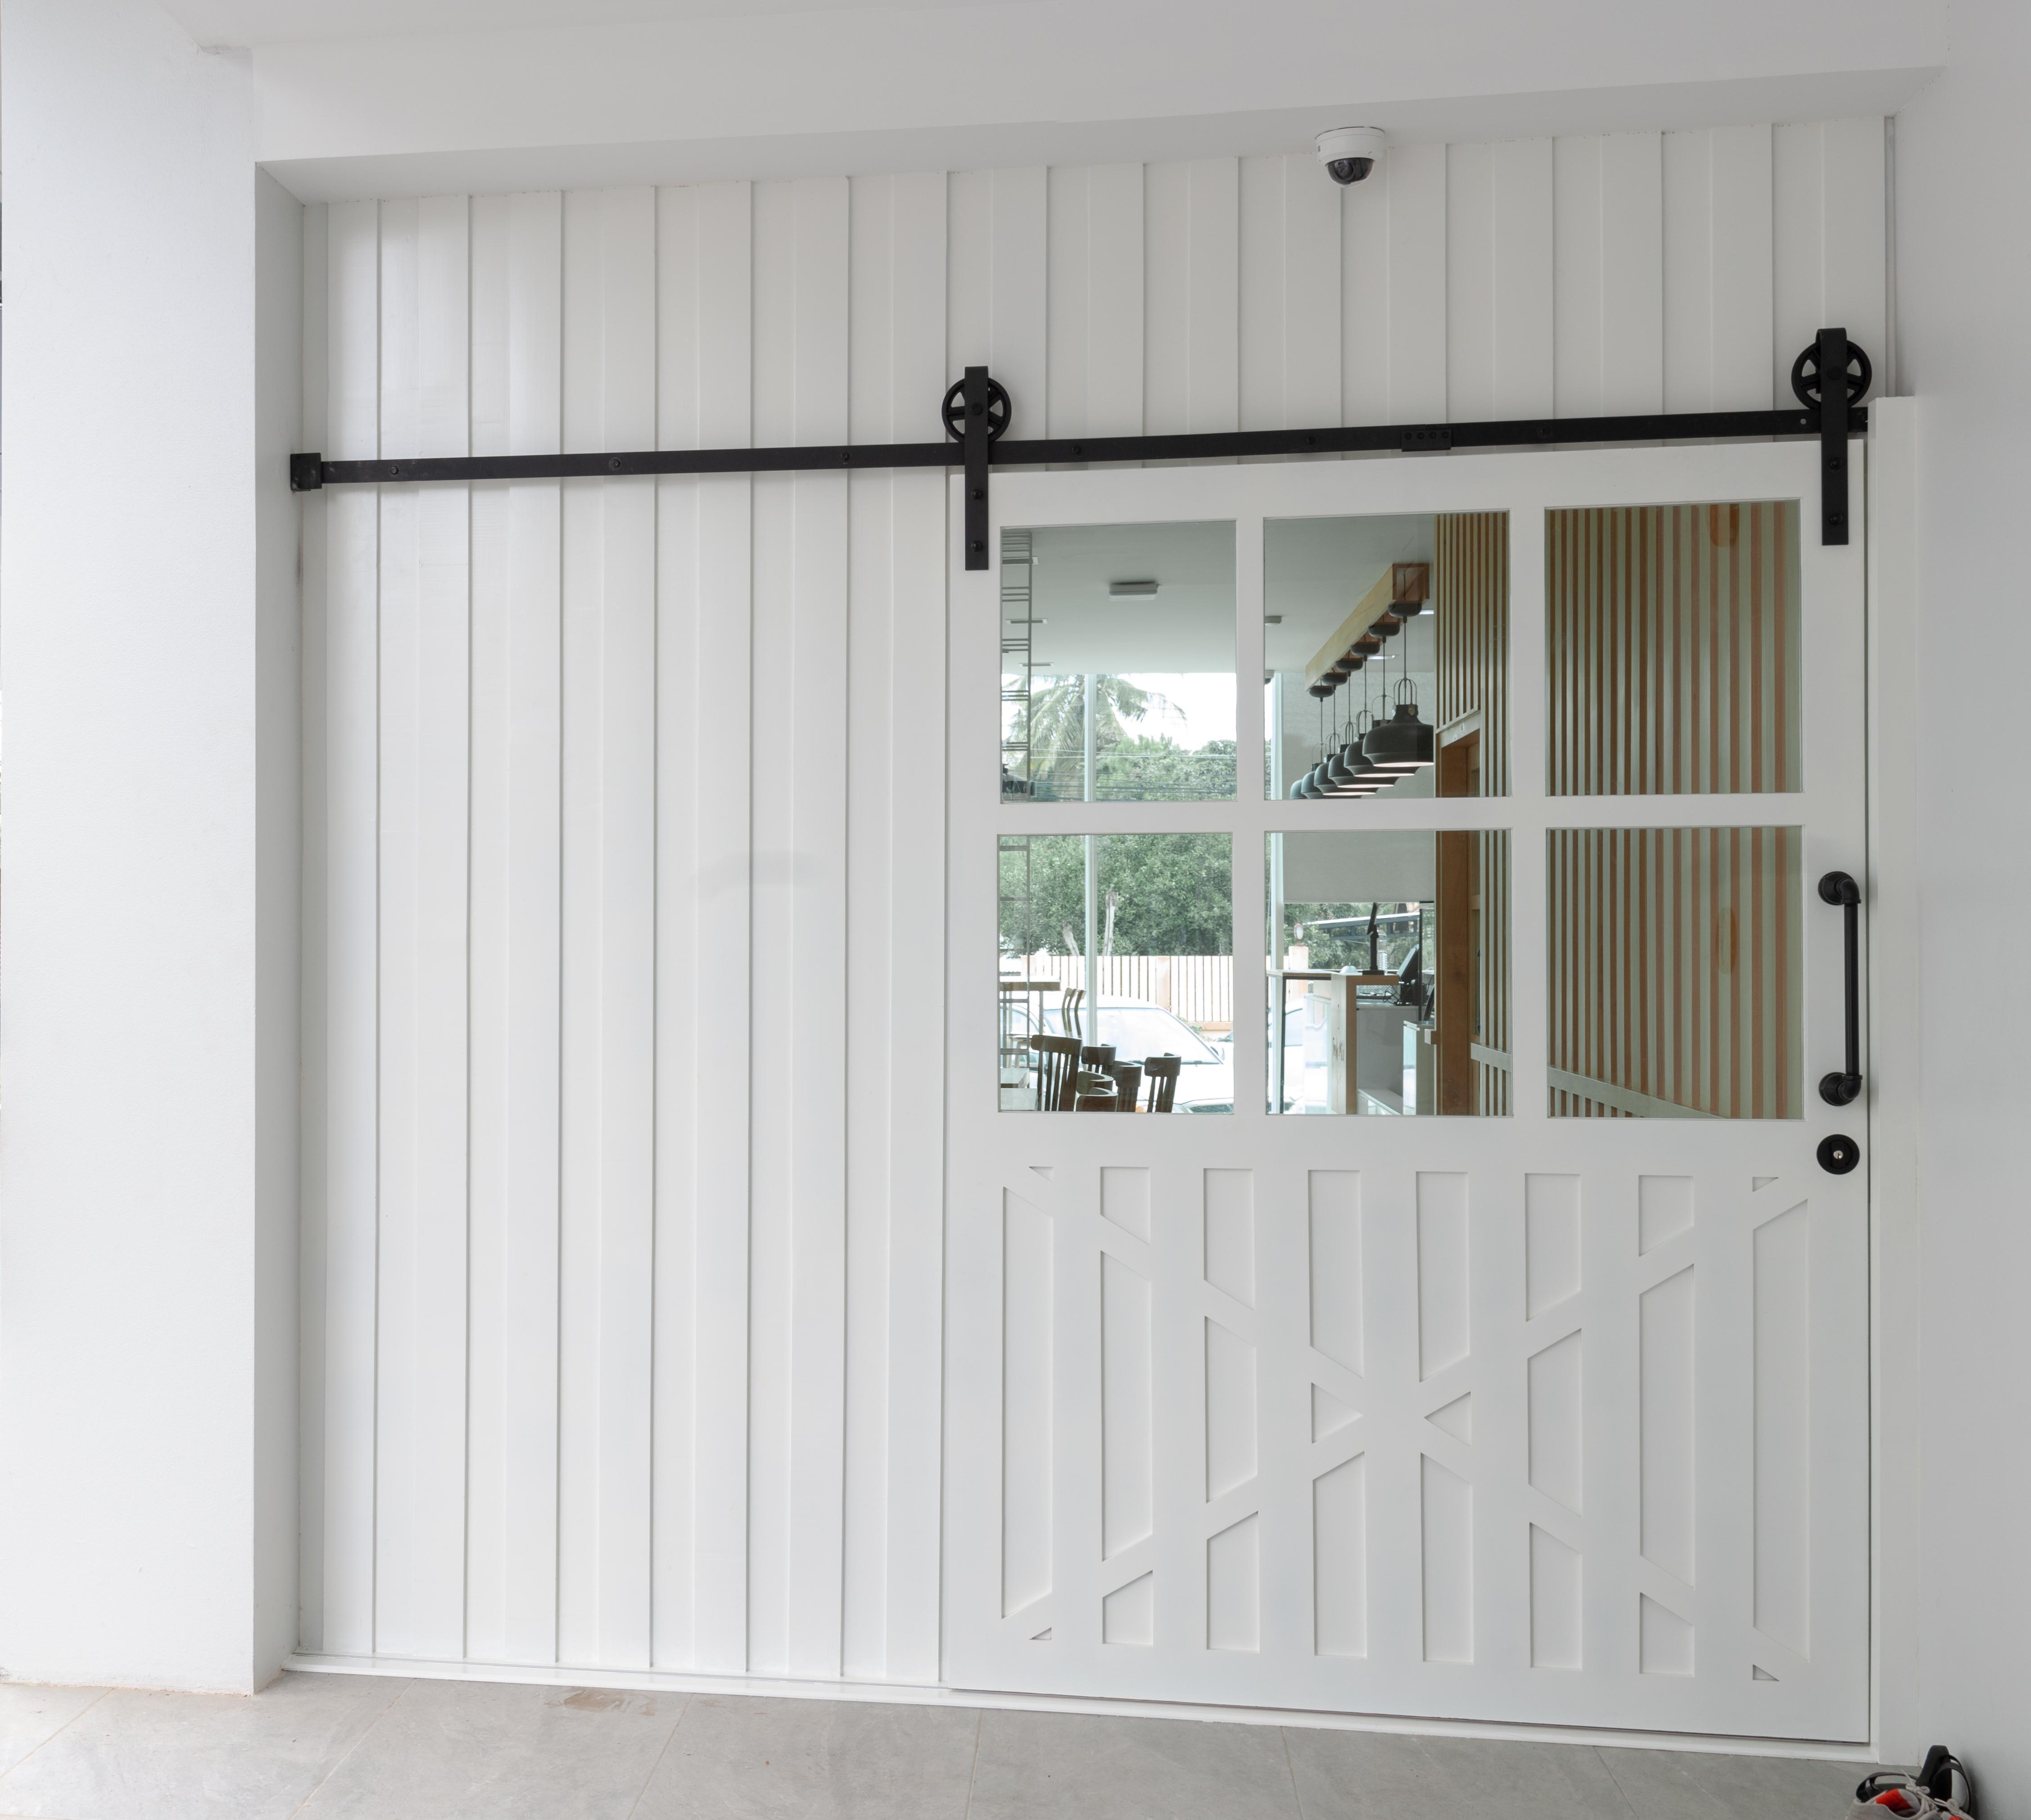 INT-Barn door style